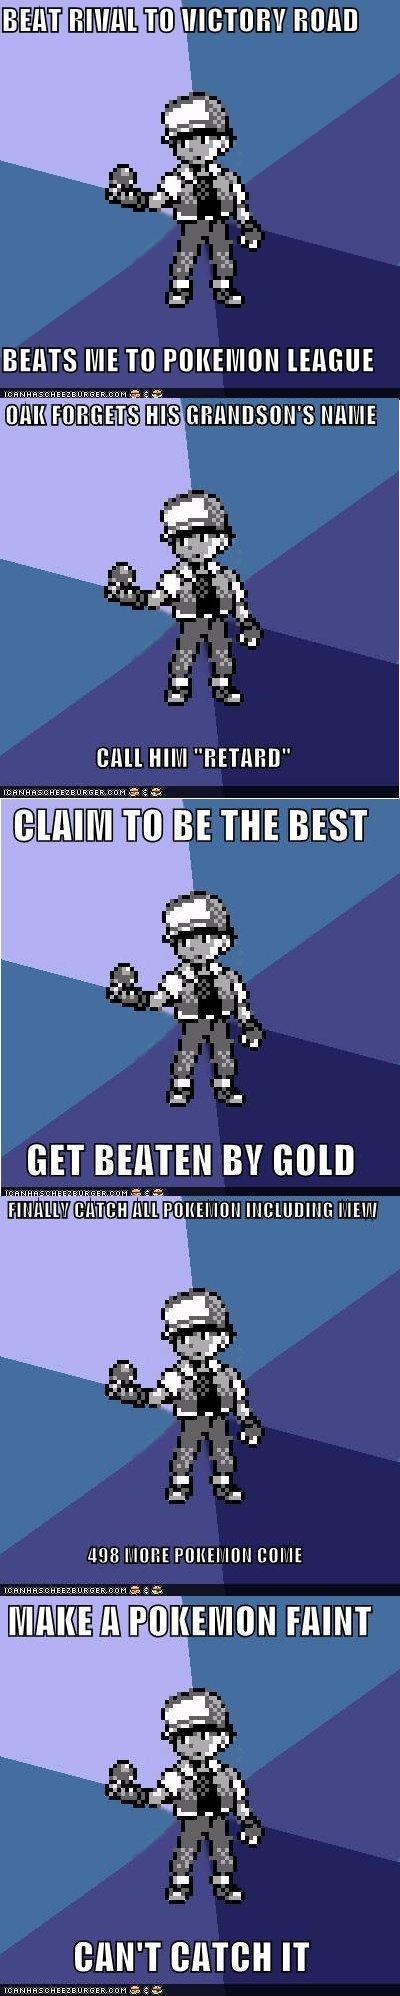 Pokemon_58fe68_2188077 pokemon red meme comp